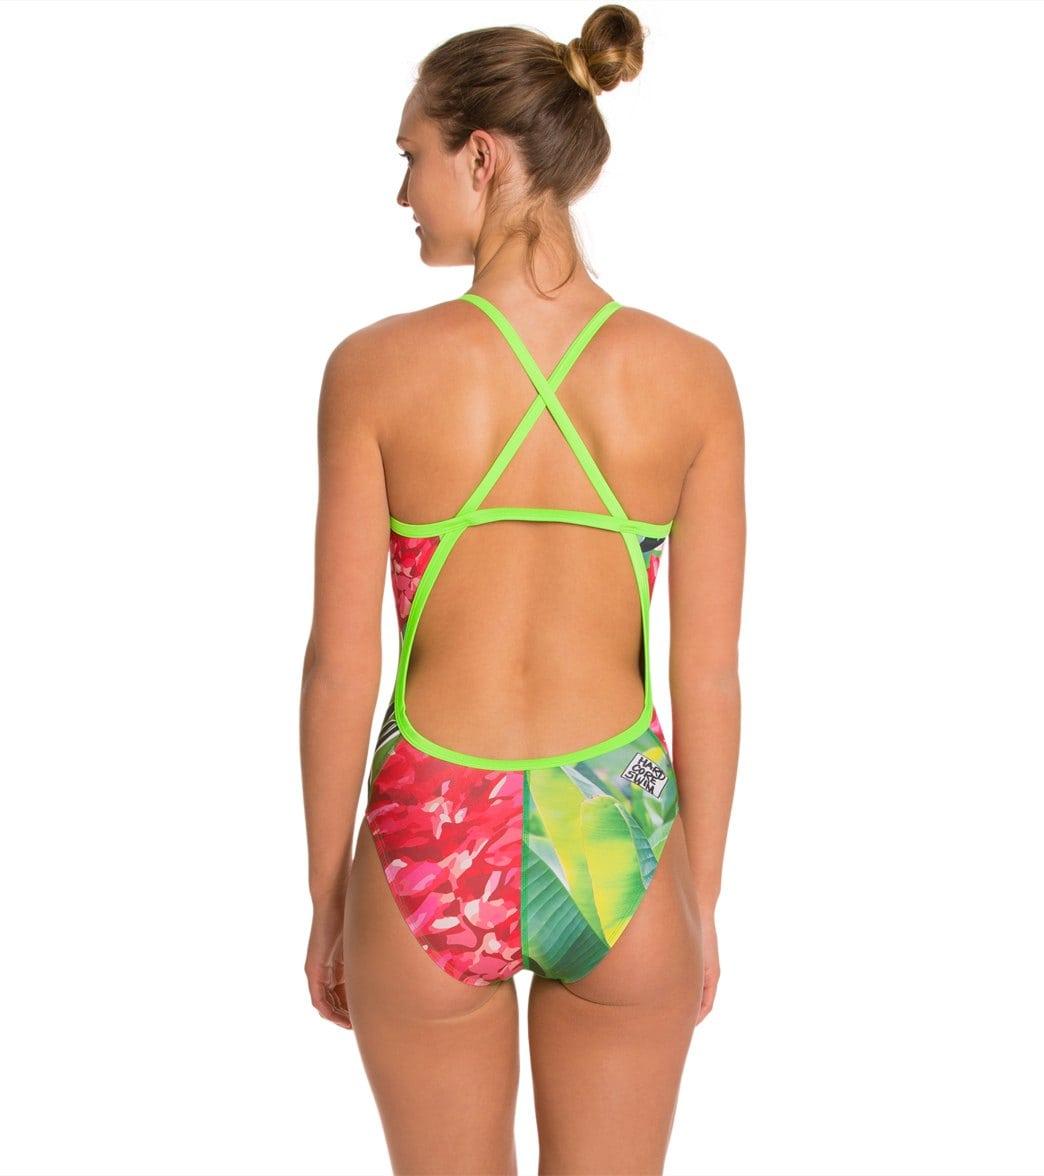 f5c30babda0 HARDCORESPORT Women's Red/Green Hula X Back One Piece Swimsuit at ...